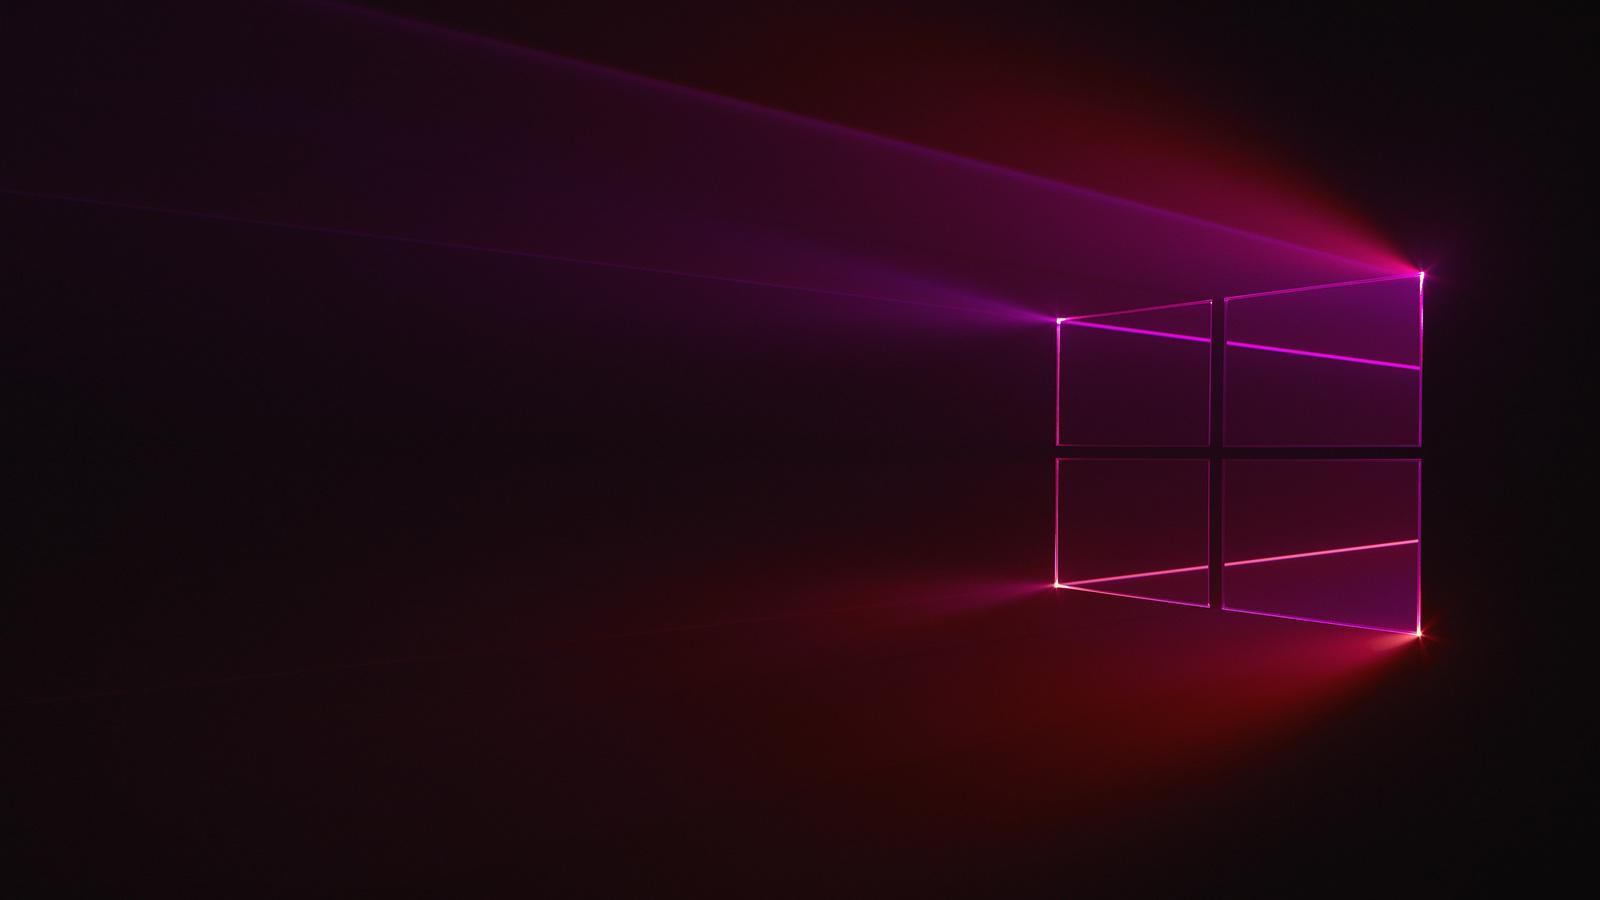 1600x900 windows 10 glass background 1600x900 resolution hd 4k